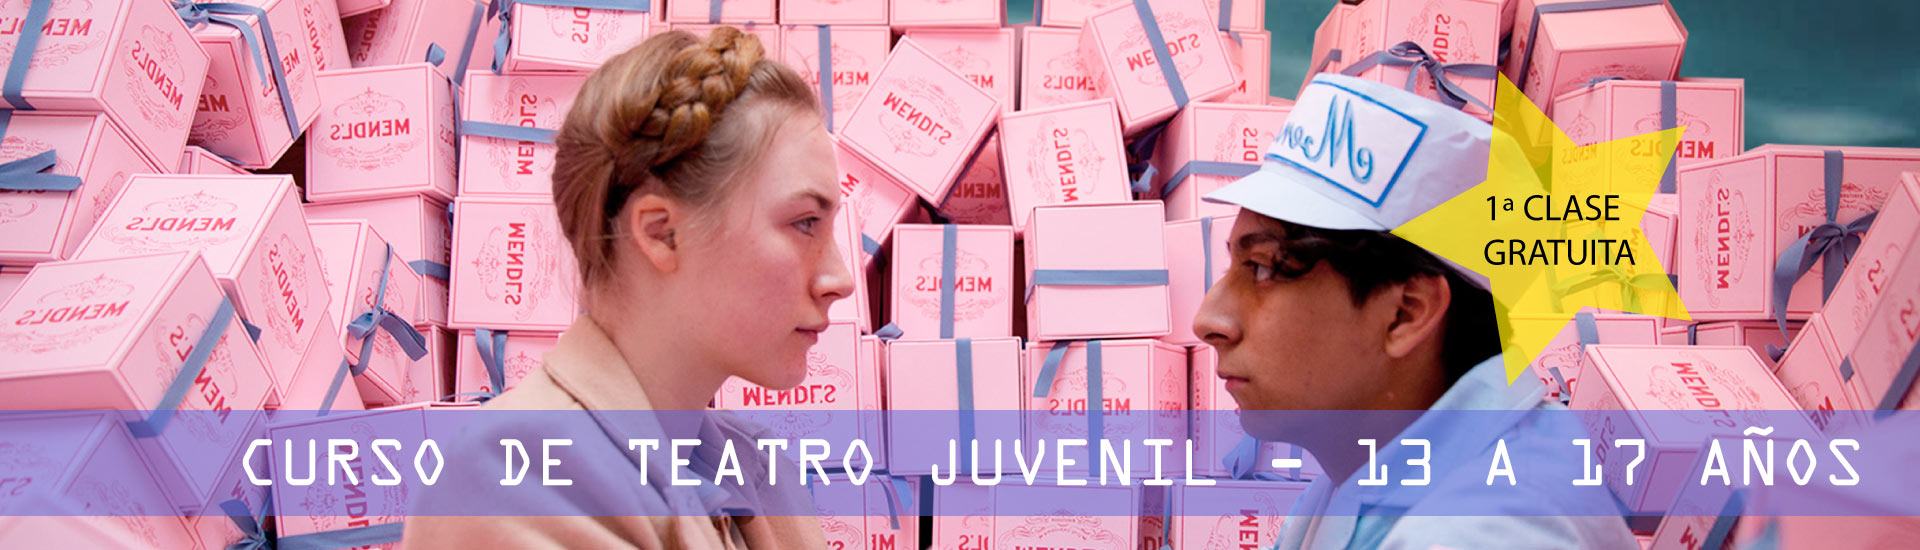 slide-TEATRO-JUVENIL